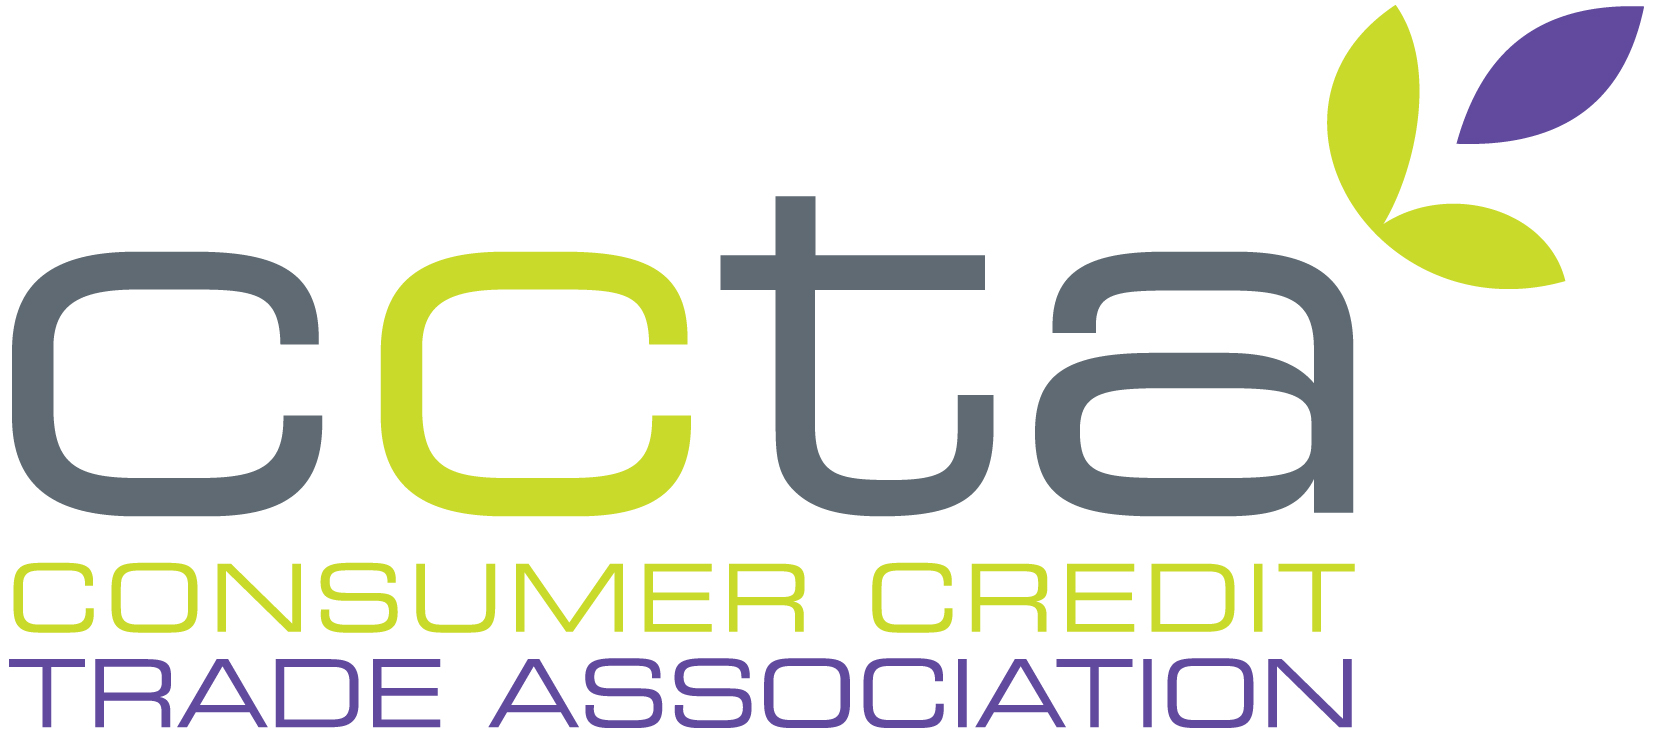 CCTA (Consumer Credit Trade Association)